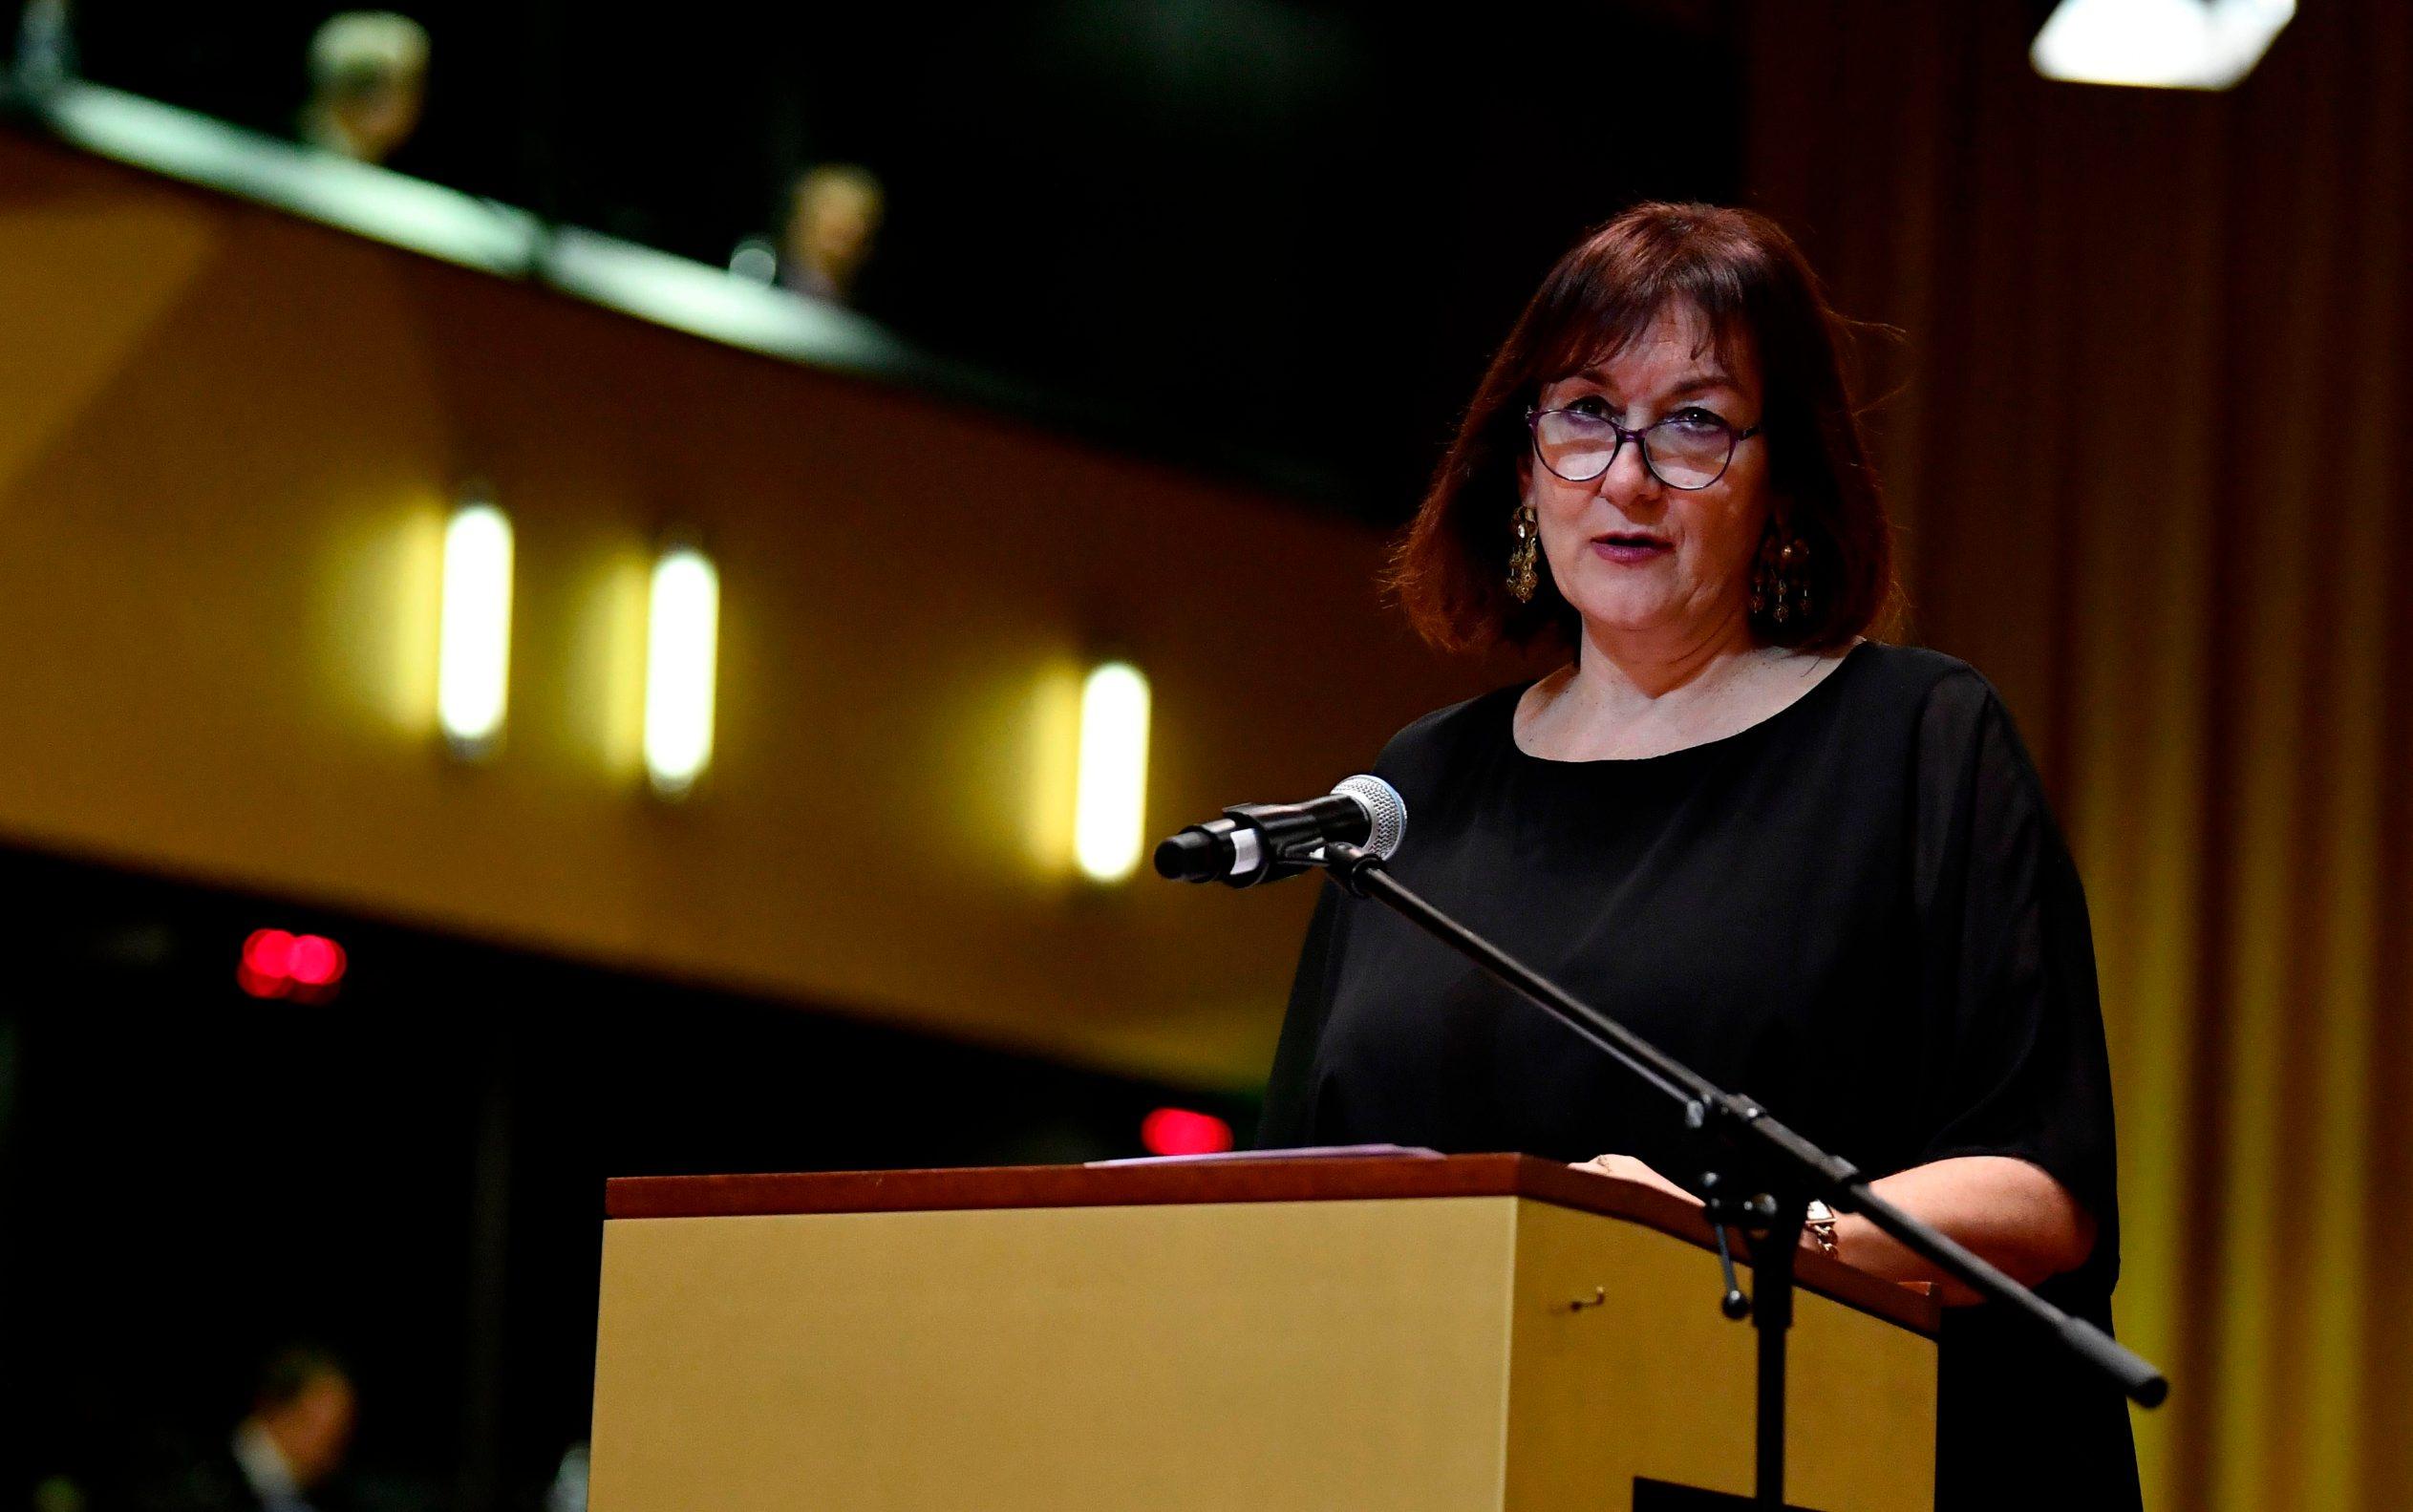 EC Vice President of Democracy and Demography Dubravka Šuica